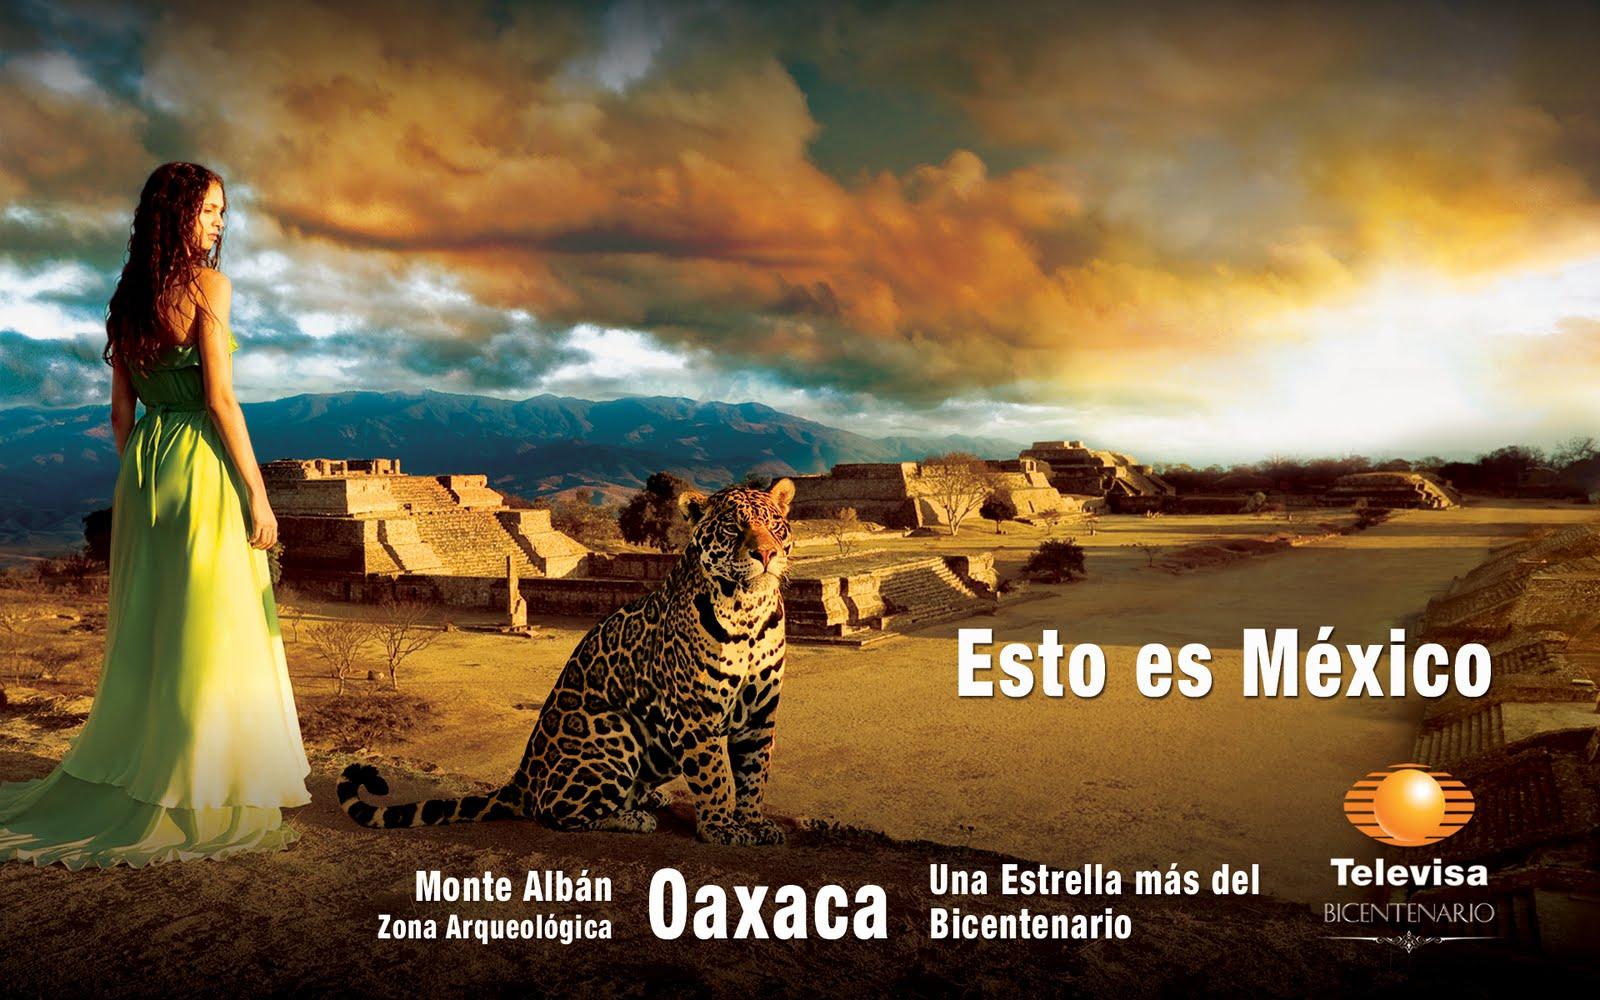 http://4.bp.blogspot.com/_DXPmhYwKhEA/TDzo0Lm55hI/AAAAAAAAABs/D5x-JB_eGXg/s1600/Oaxacamontealban.jpg